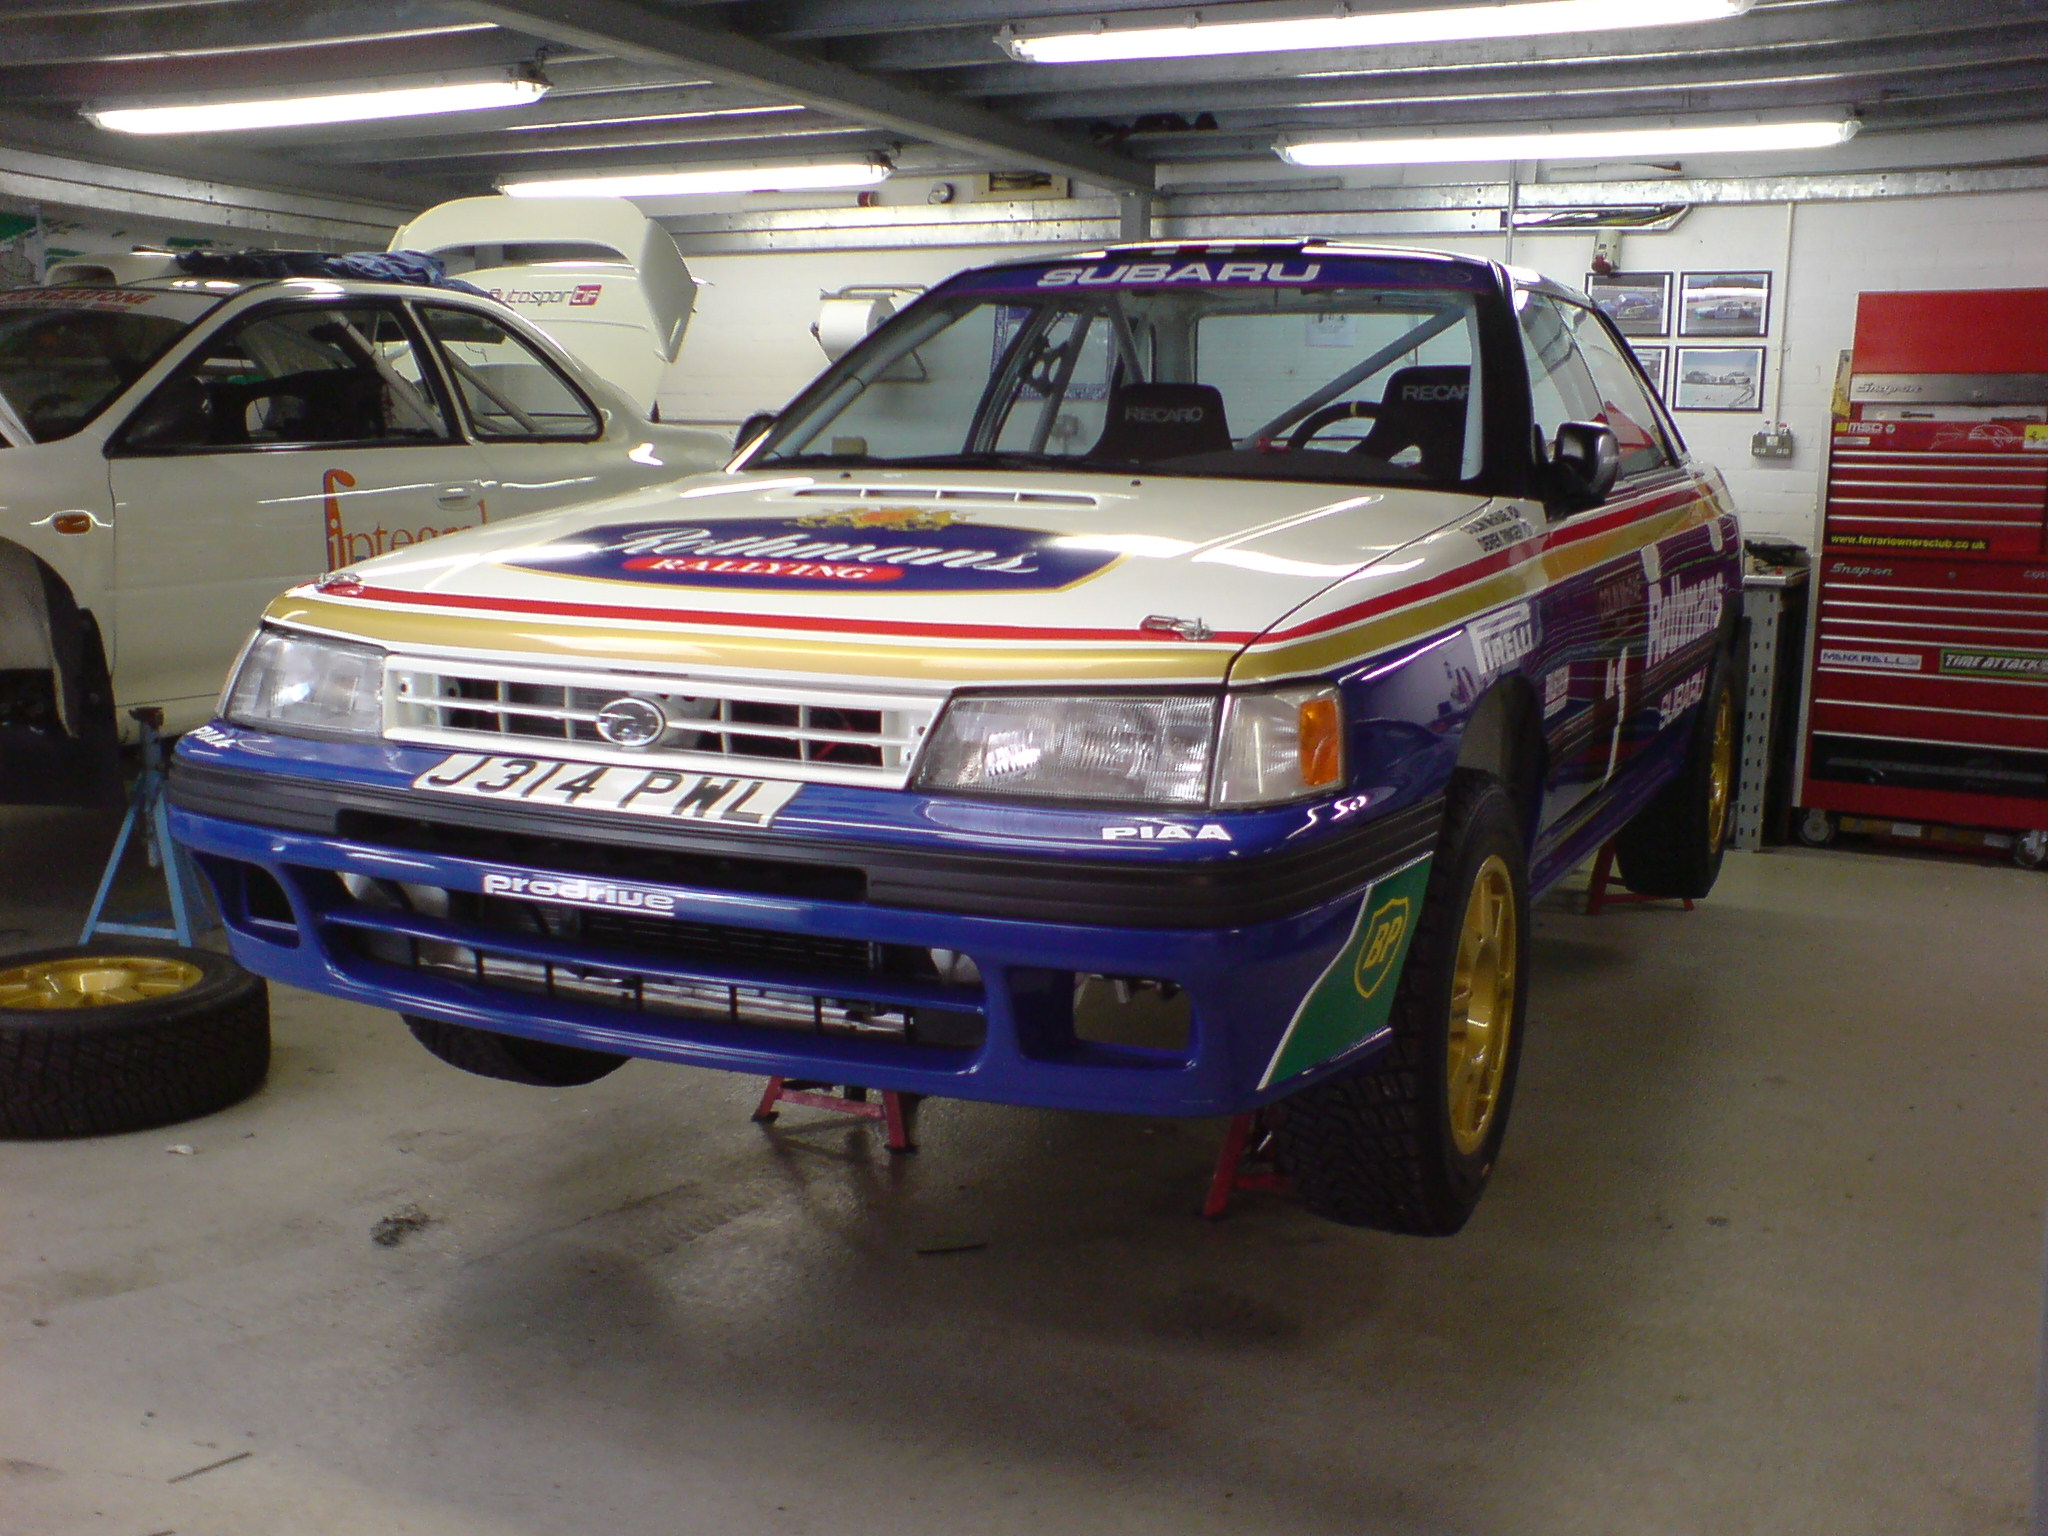 Autosportif Subaru Rally Car Preparation Workshop